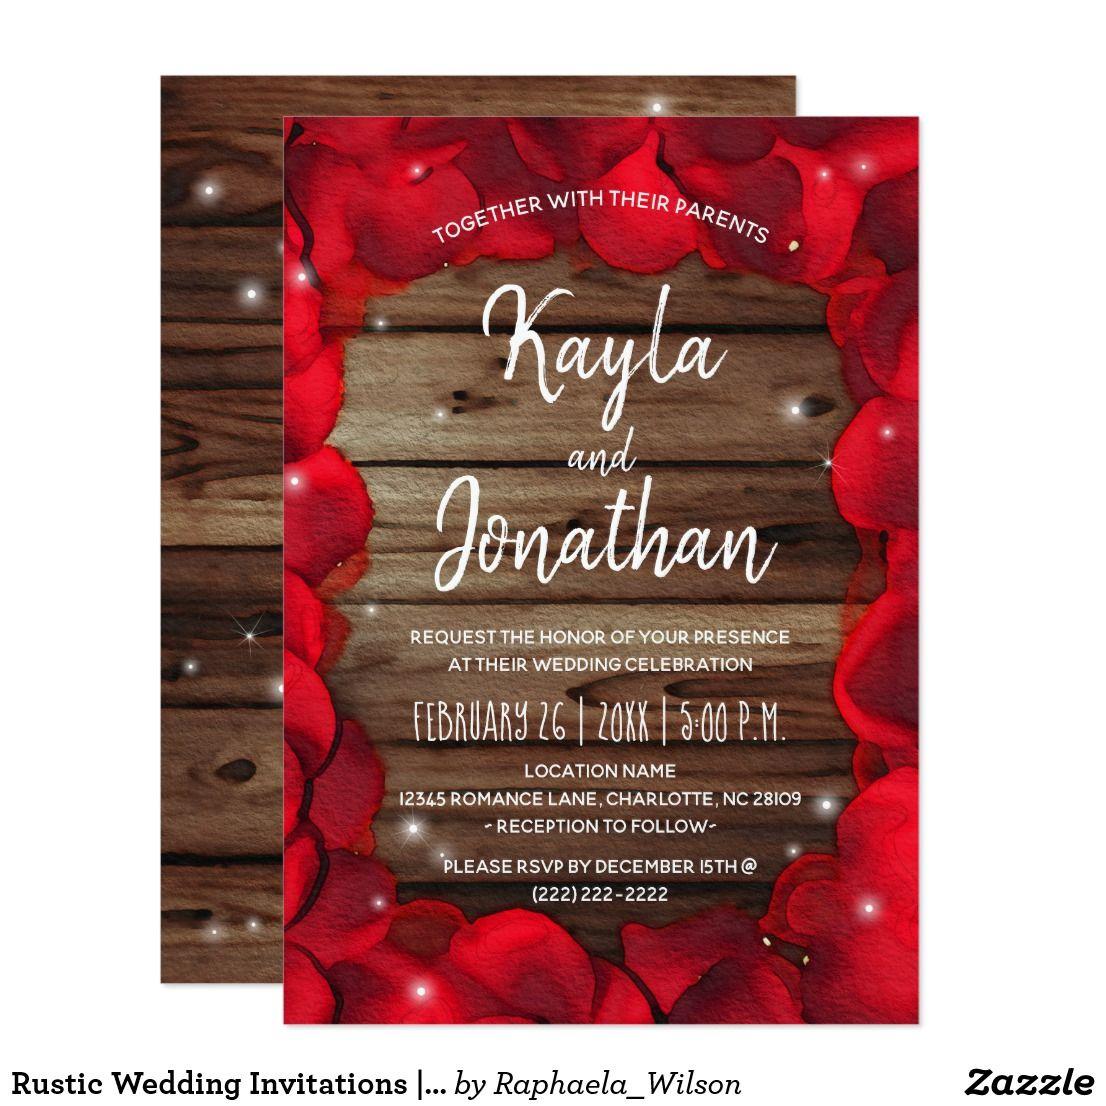 Rustic Wedding Invitations | Wood Red Rose Petals | Rustic Fall ...